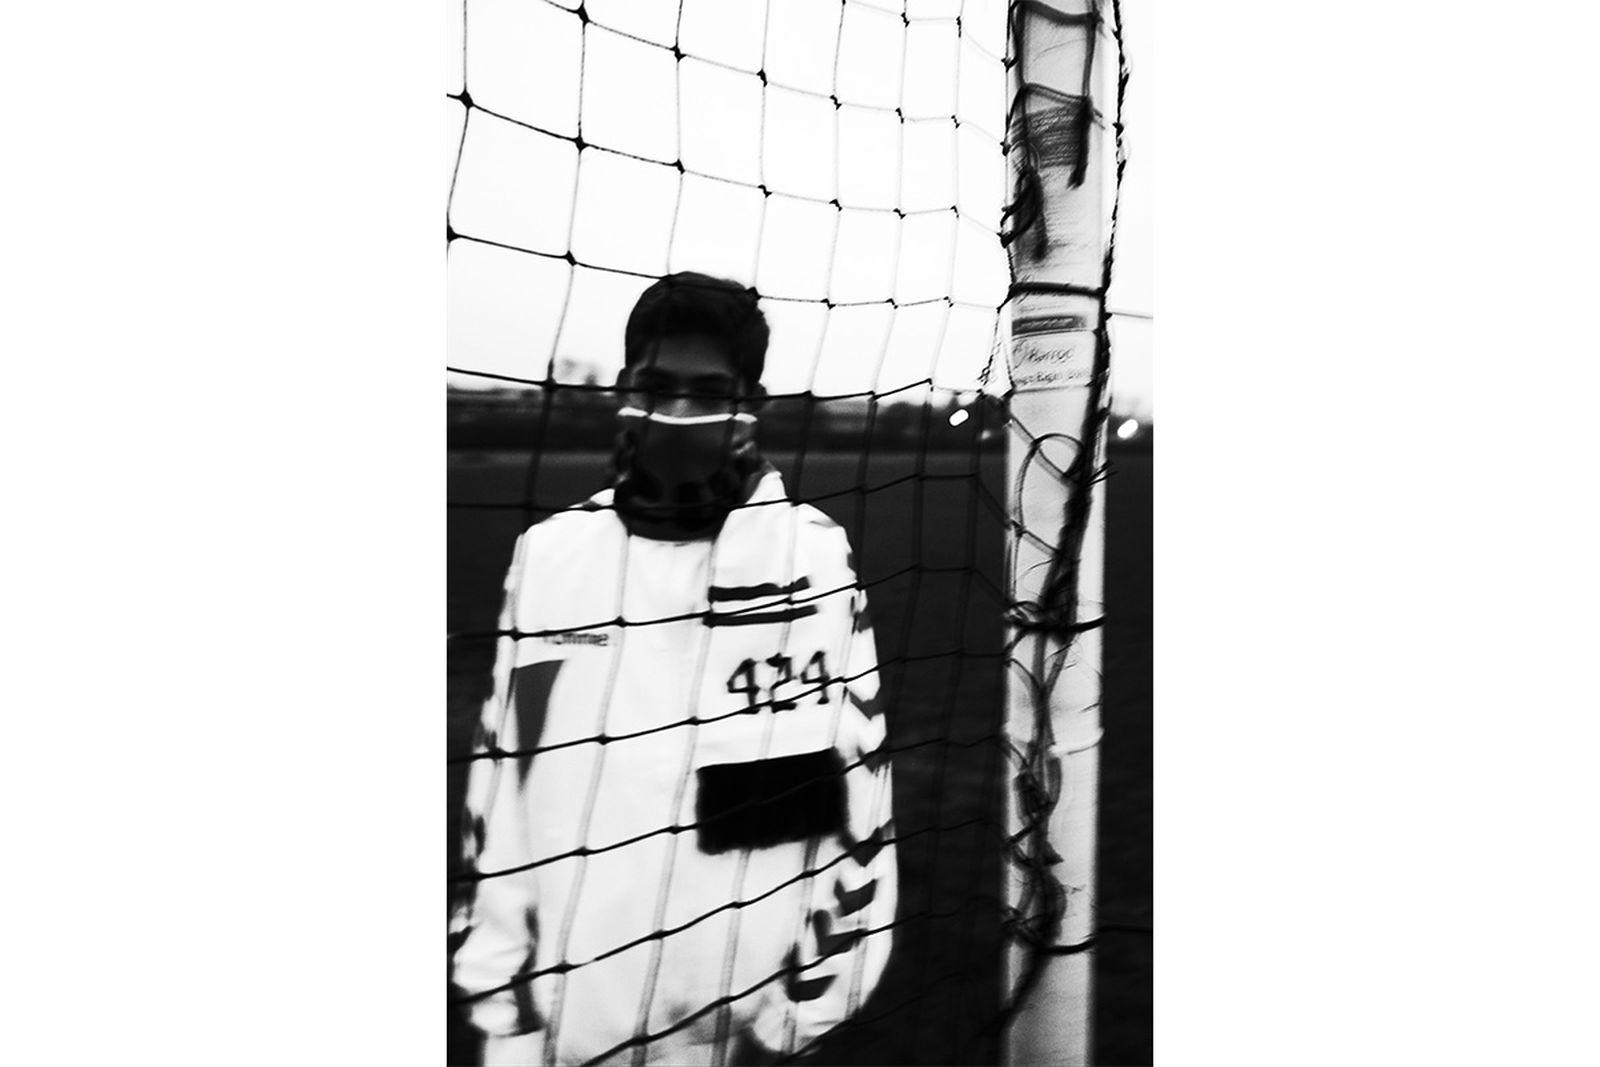 hummel-424-soccer-capsule-08